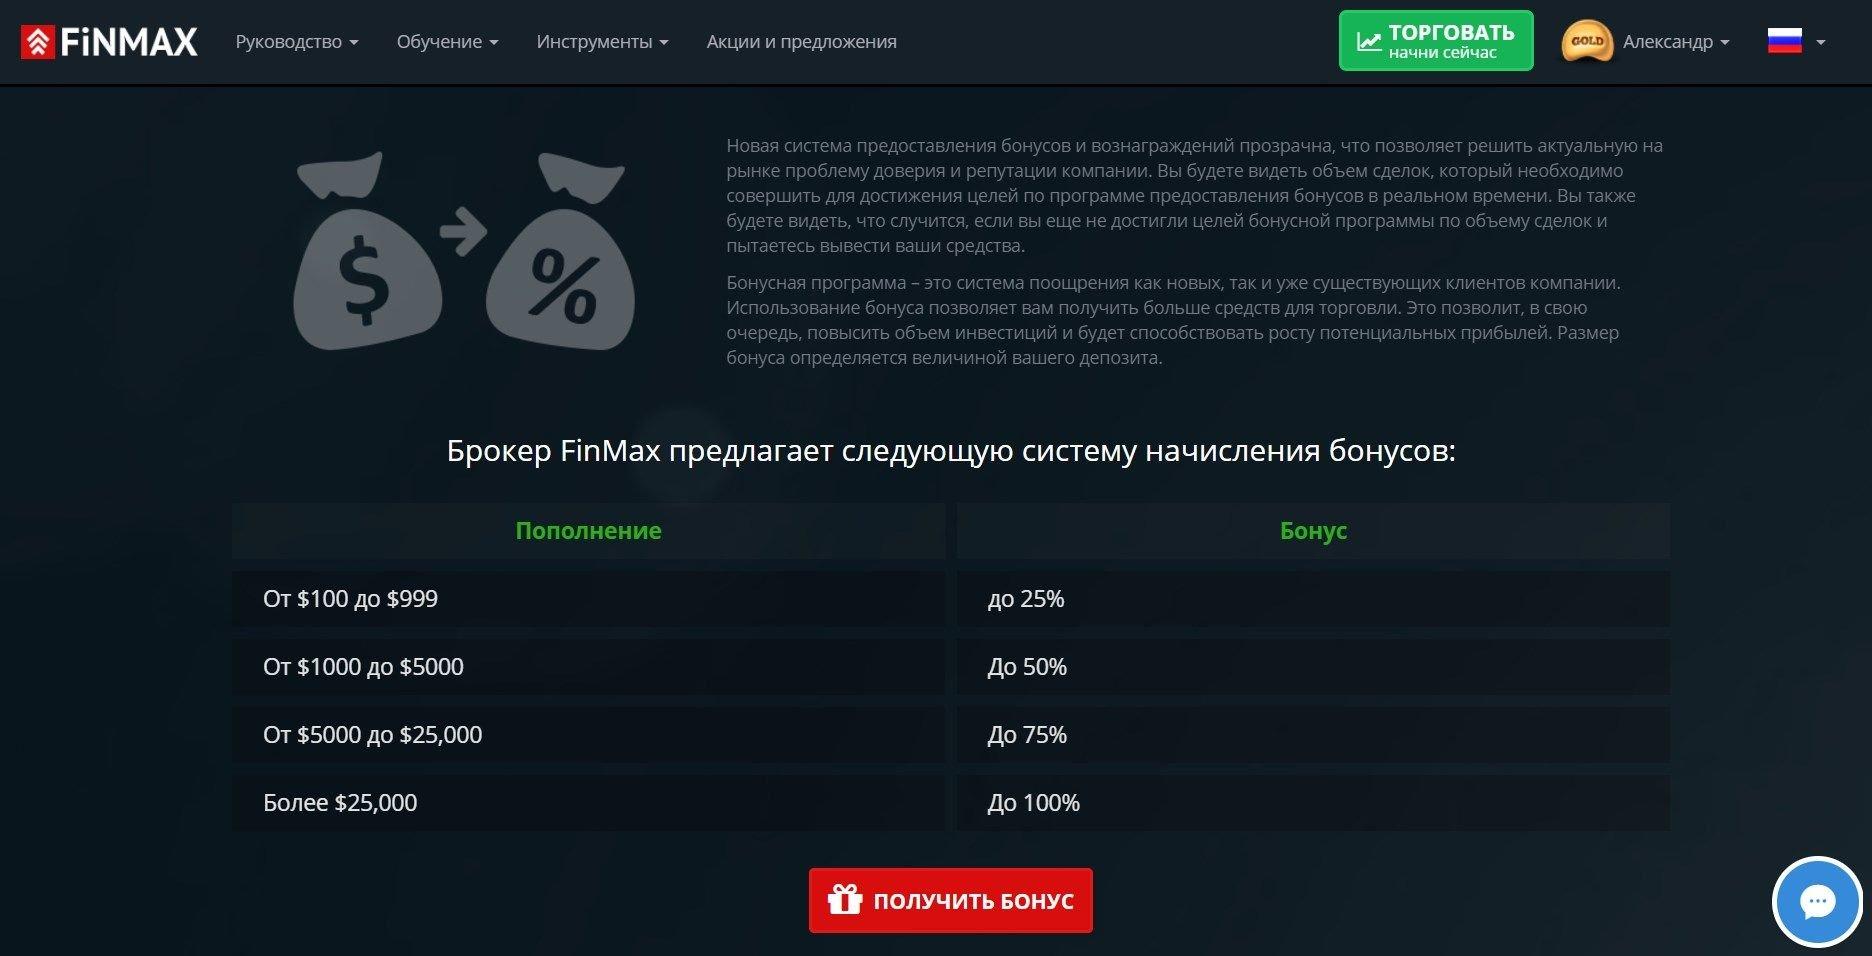 Бонусы официального сайта FiNMAX до 100%